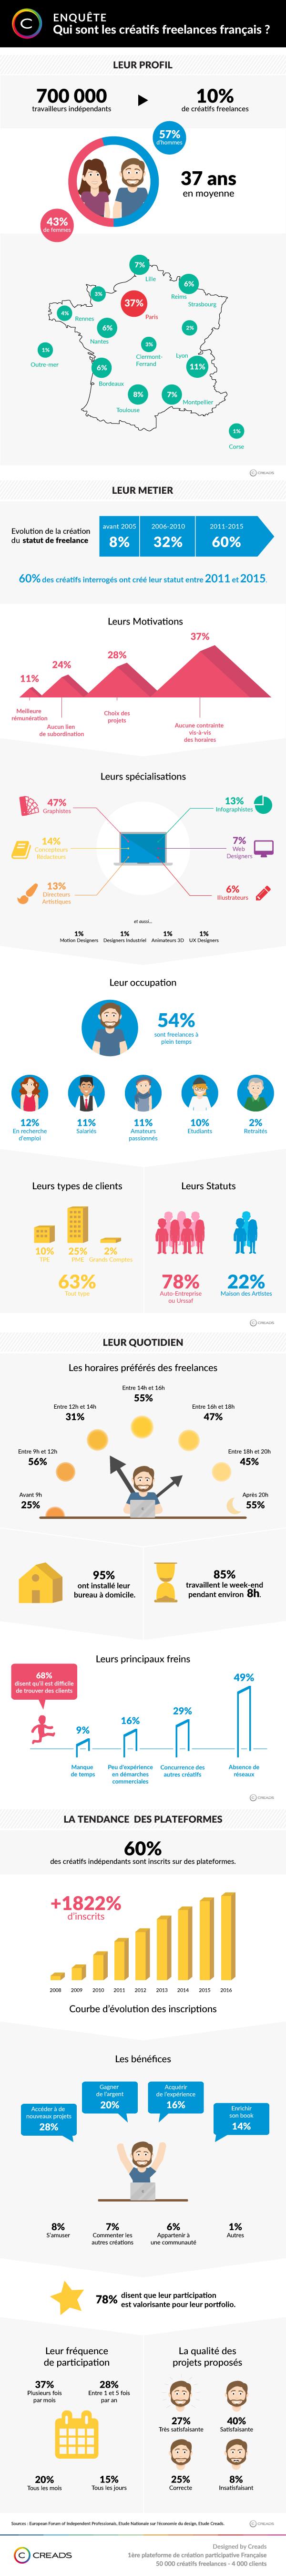 infographie-creatifs-freelances